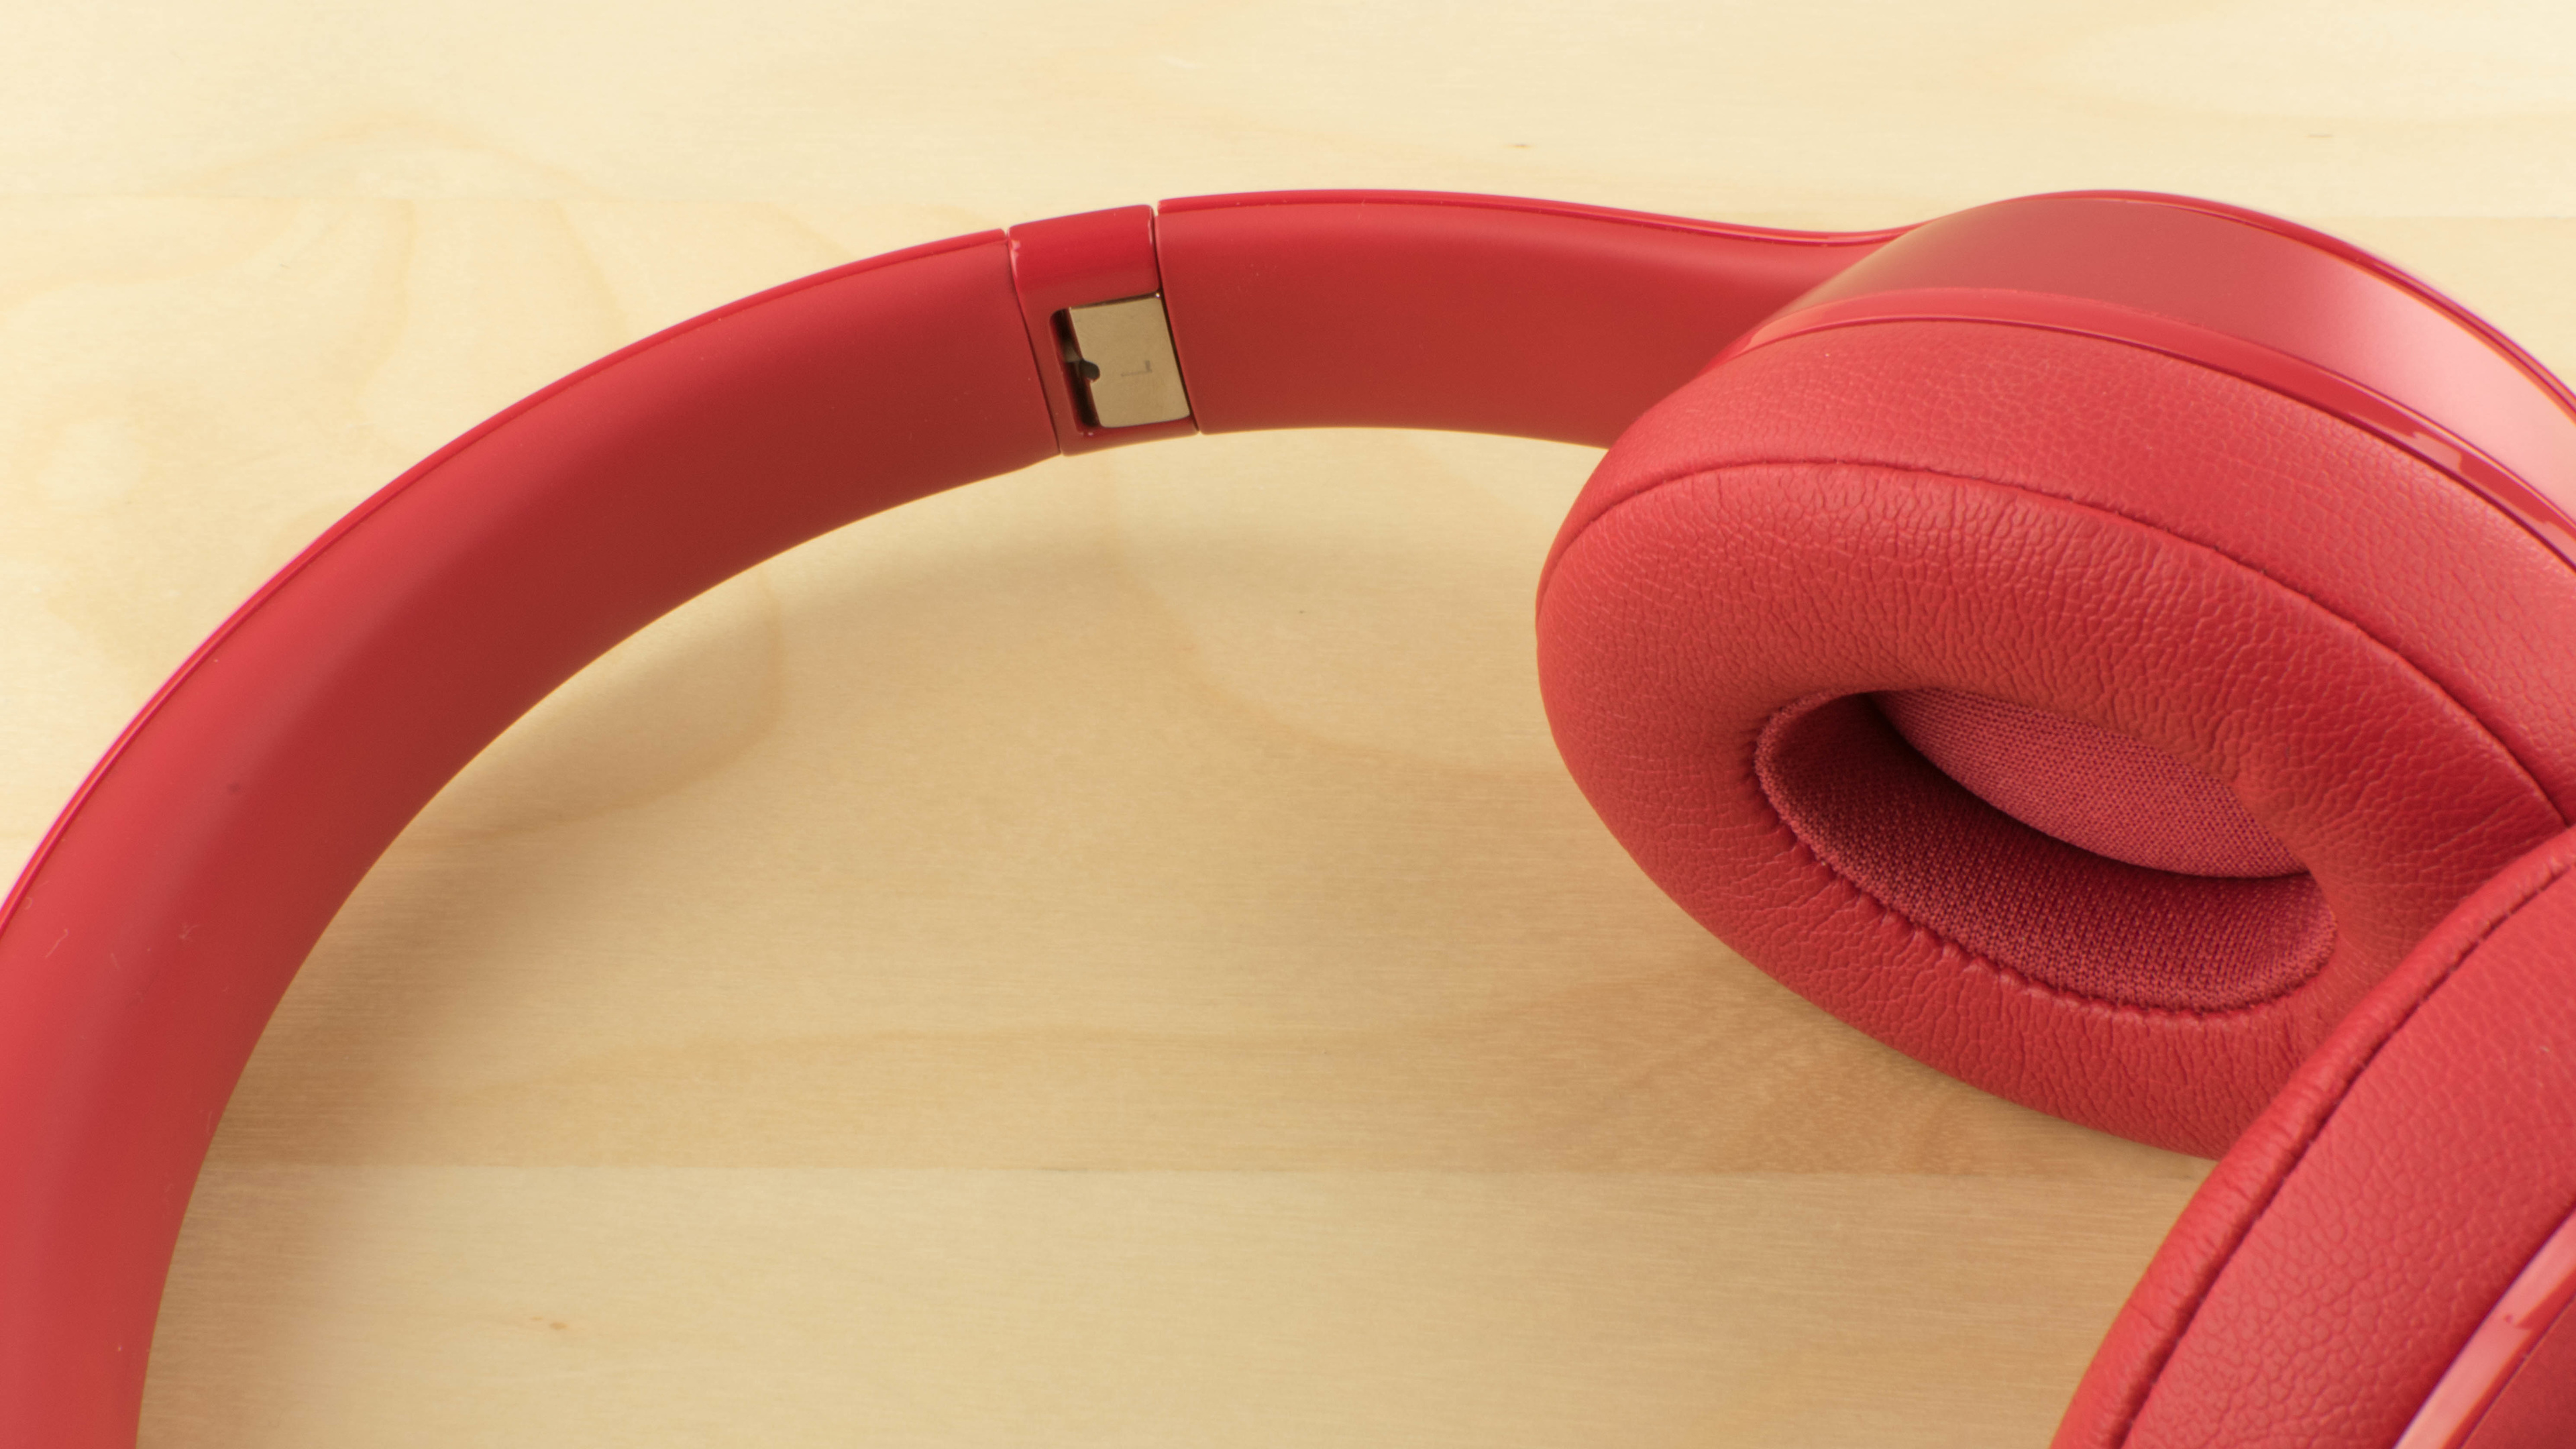 Headband headphones wireless - wireless headphones small ears